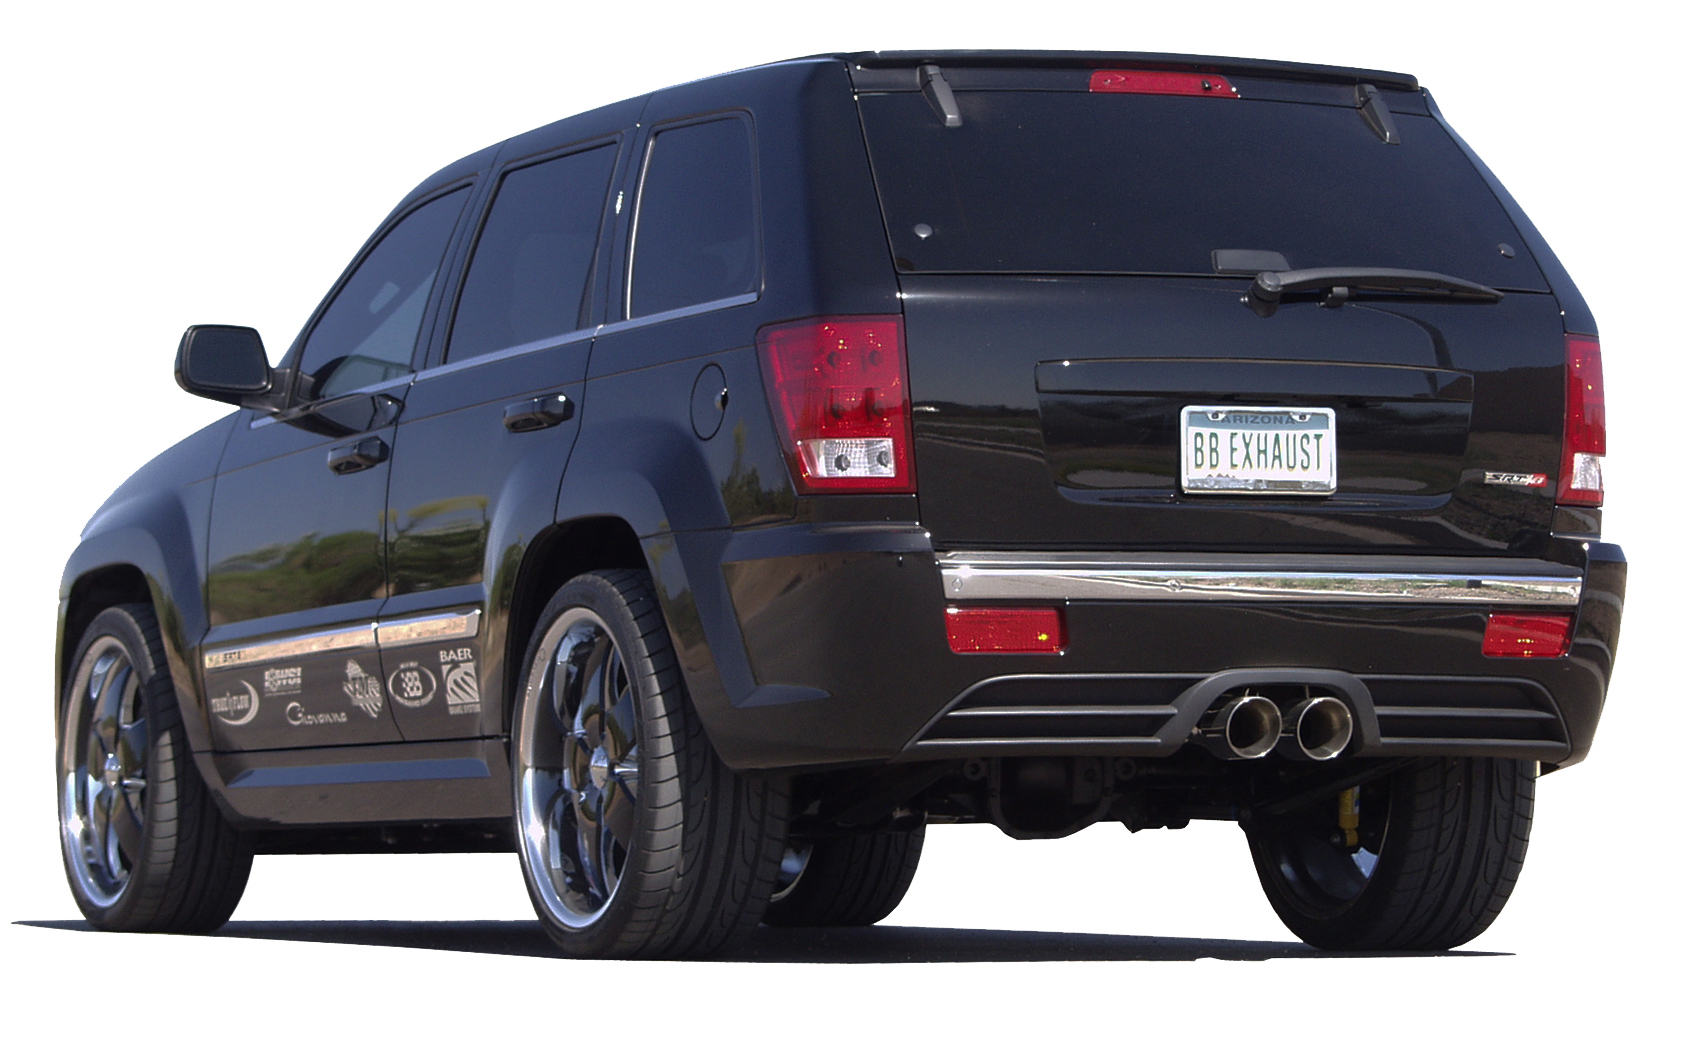 jeep grand cherokee srt8 cat back exhaust system round tips ftru 0310